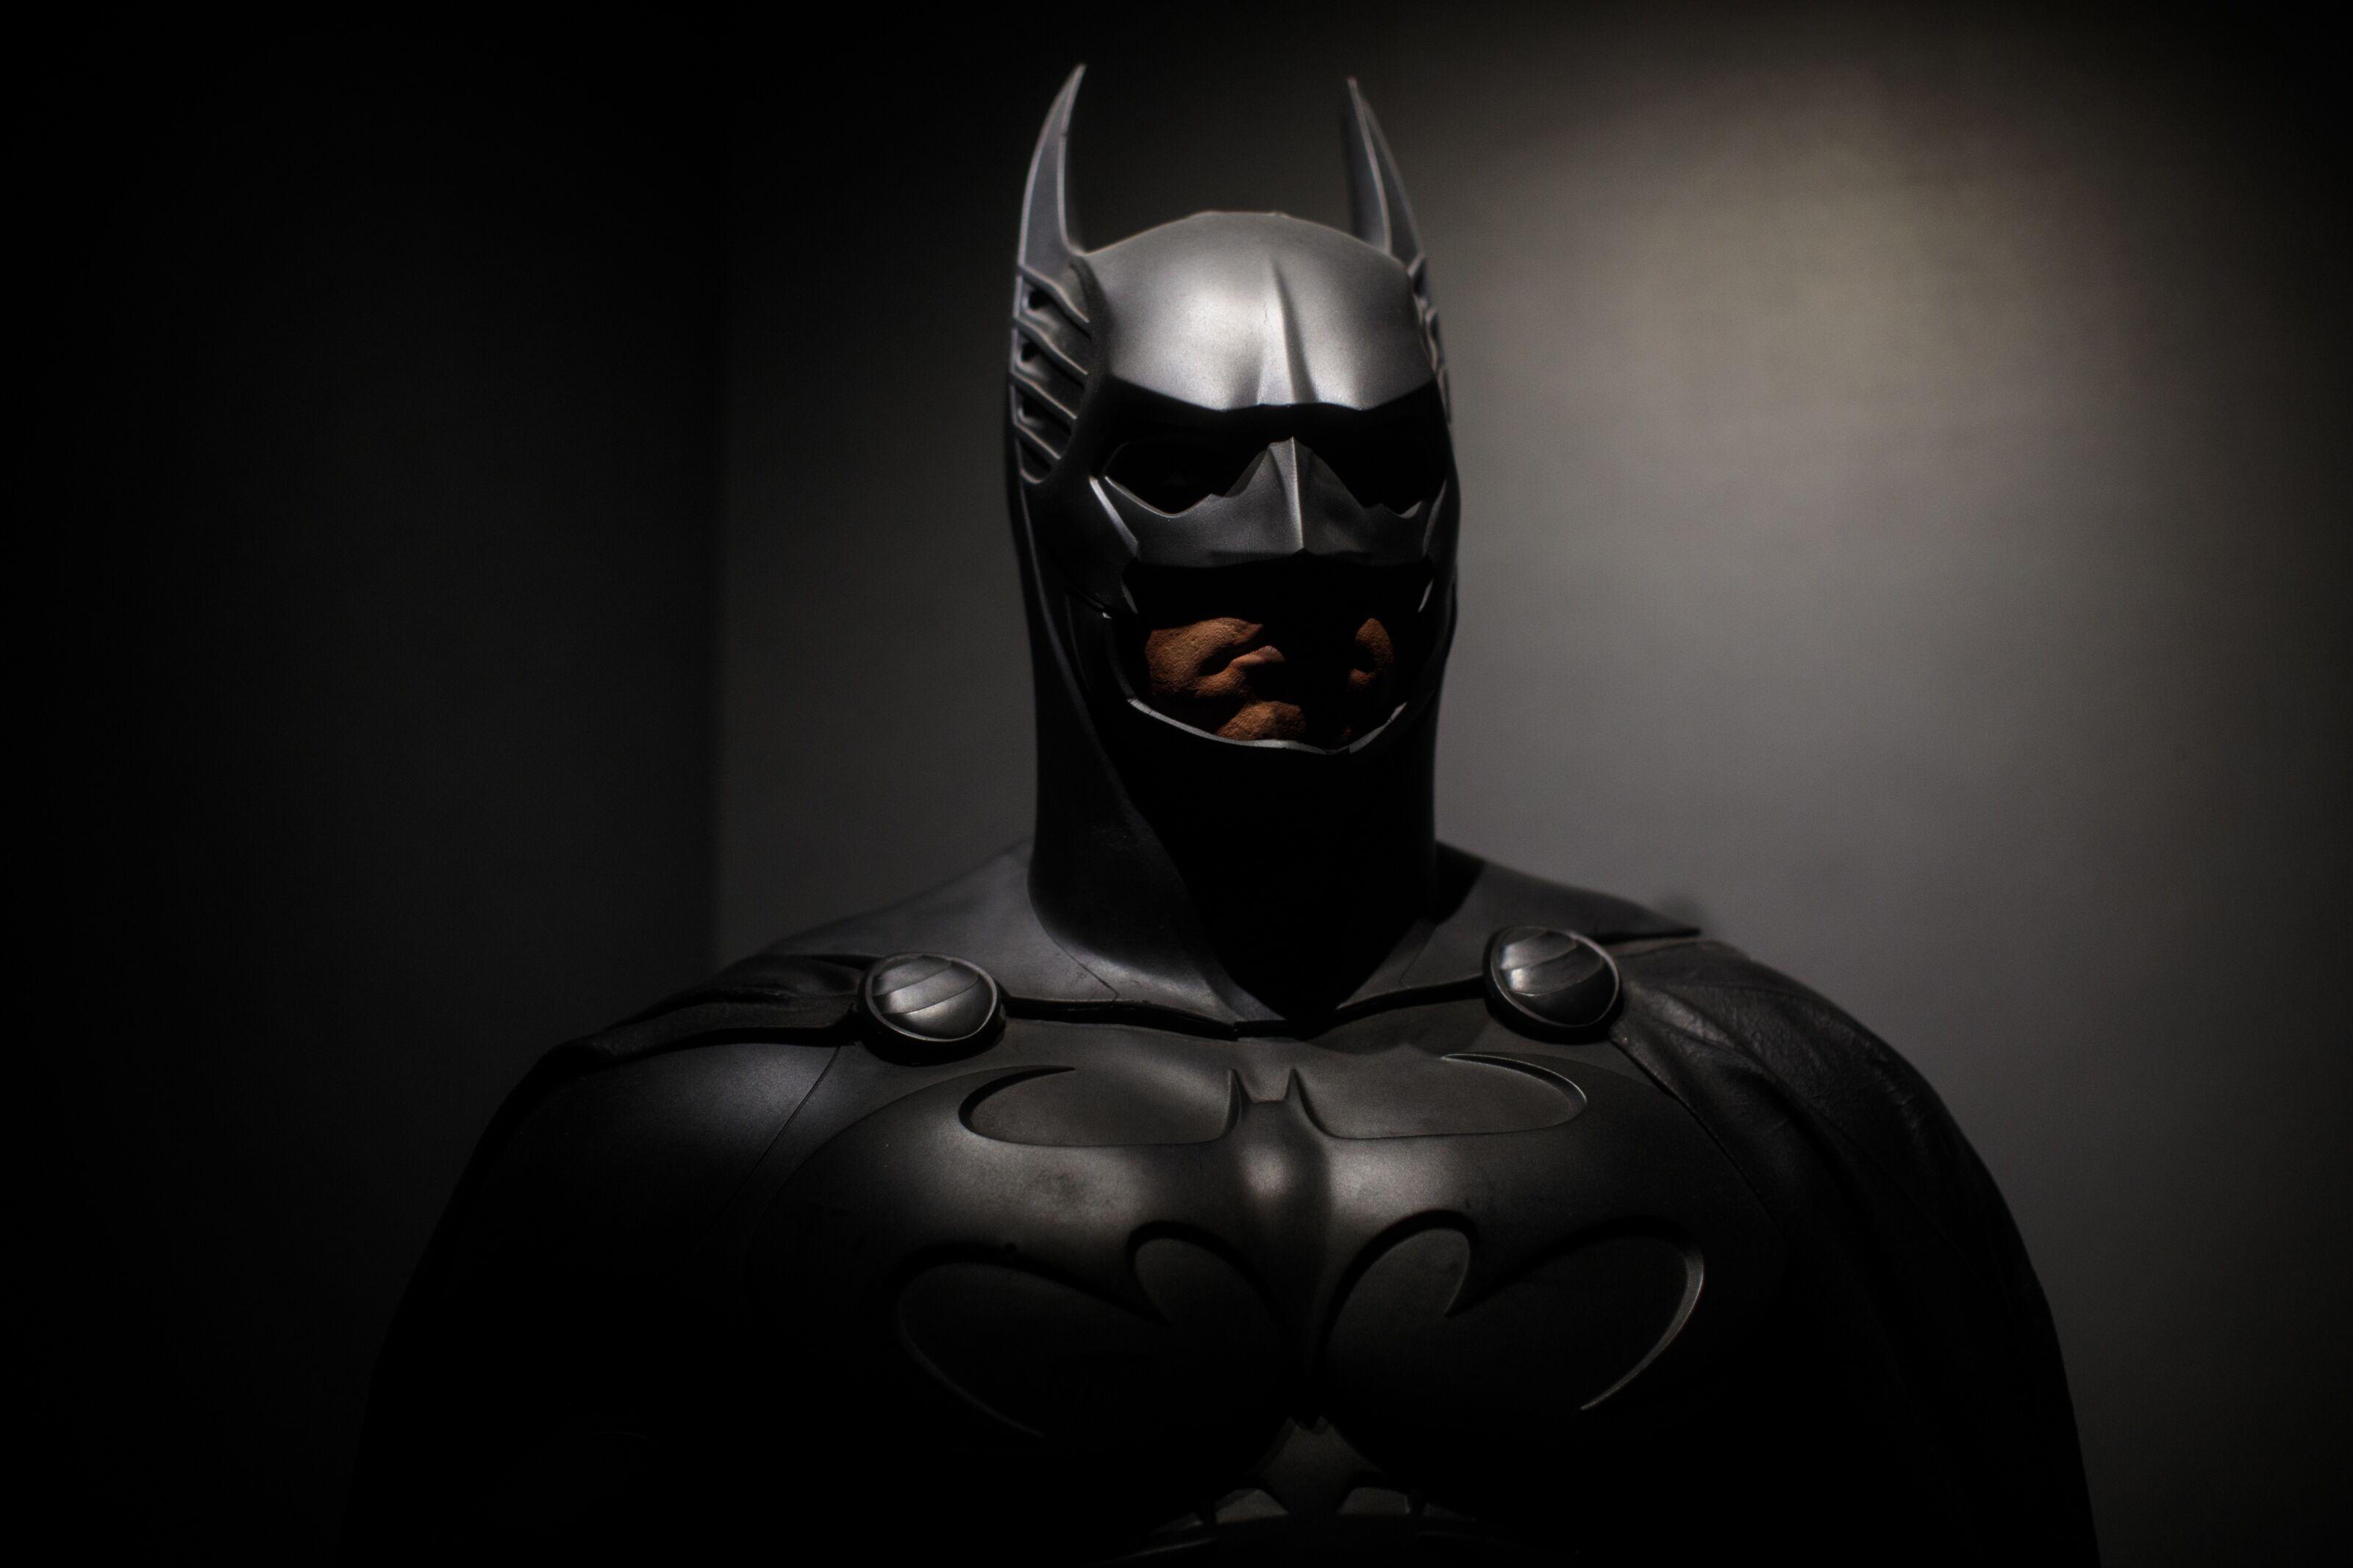 Batman Day: The five best Batman games ever released